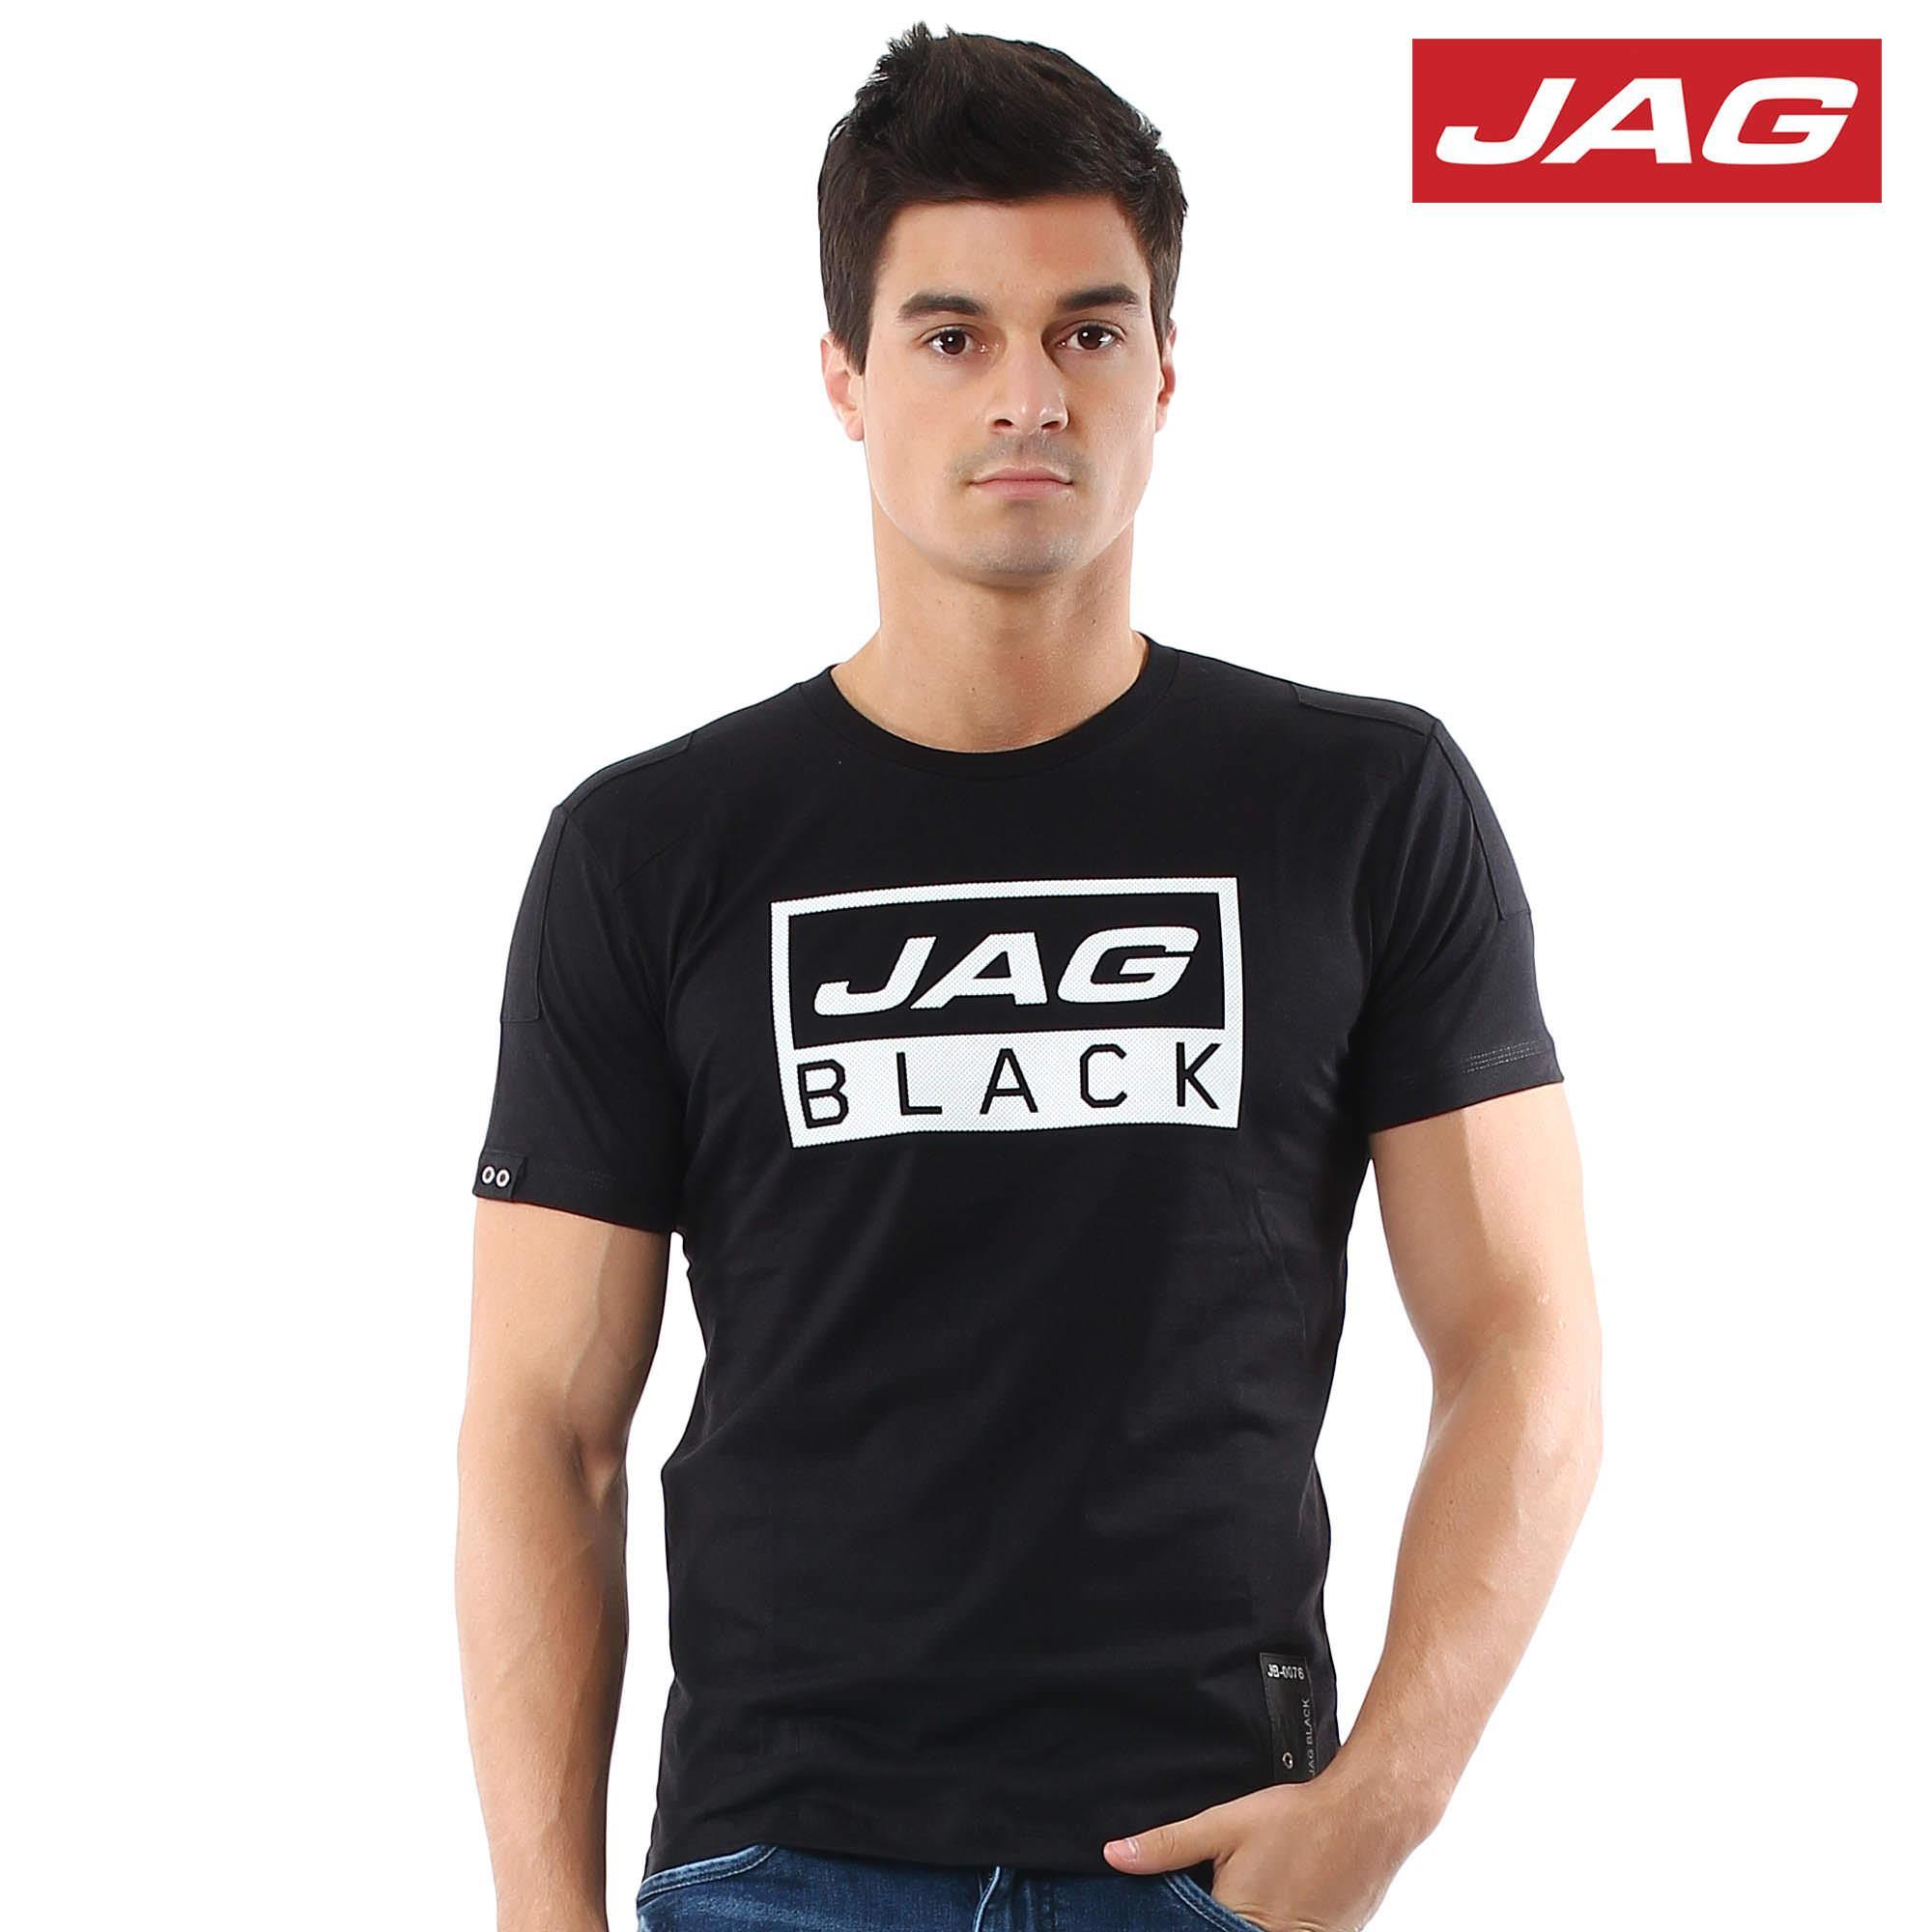 d1aec5e9cc40e JAG Philippines  JAG price list - JAG Fashion Clothing for Men ...